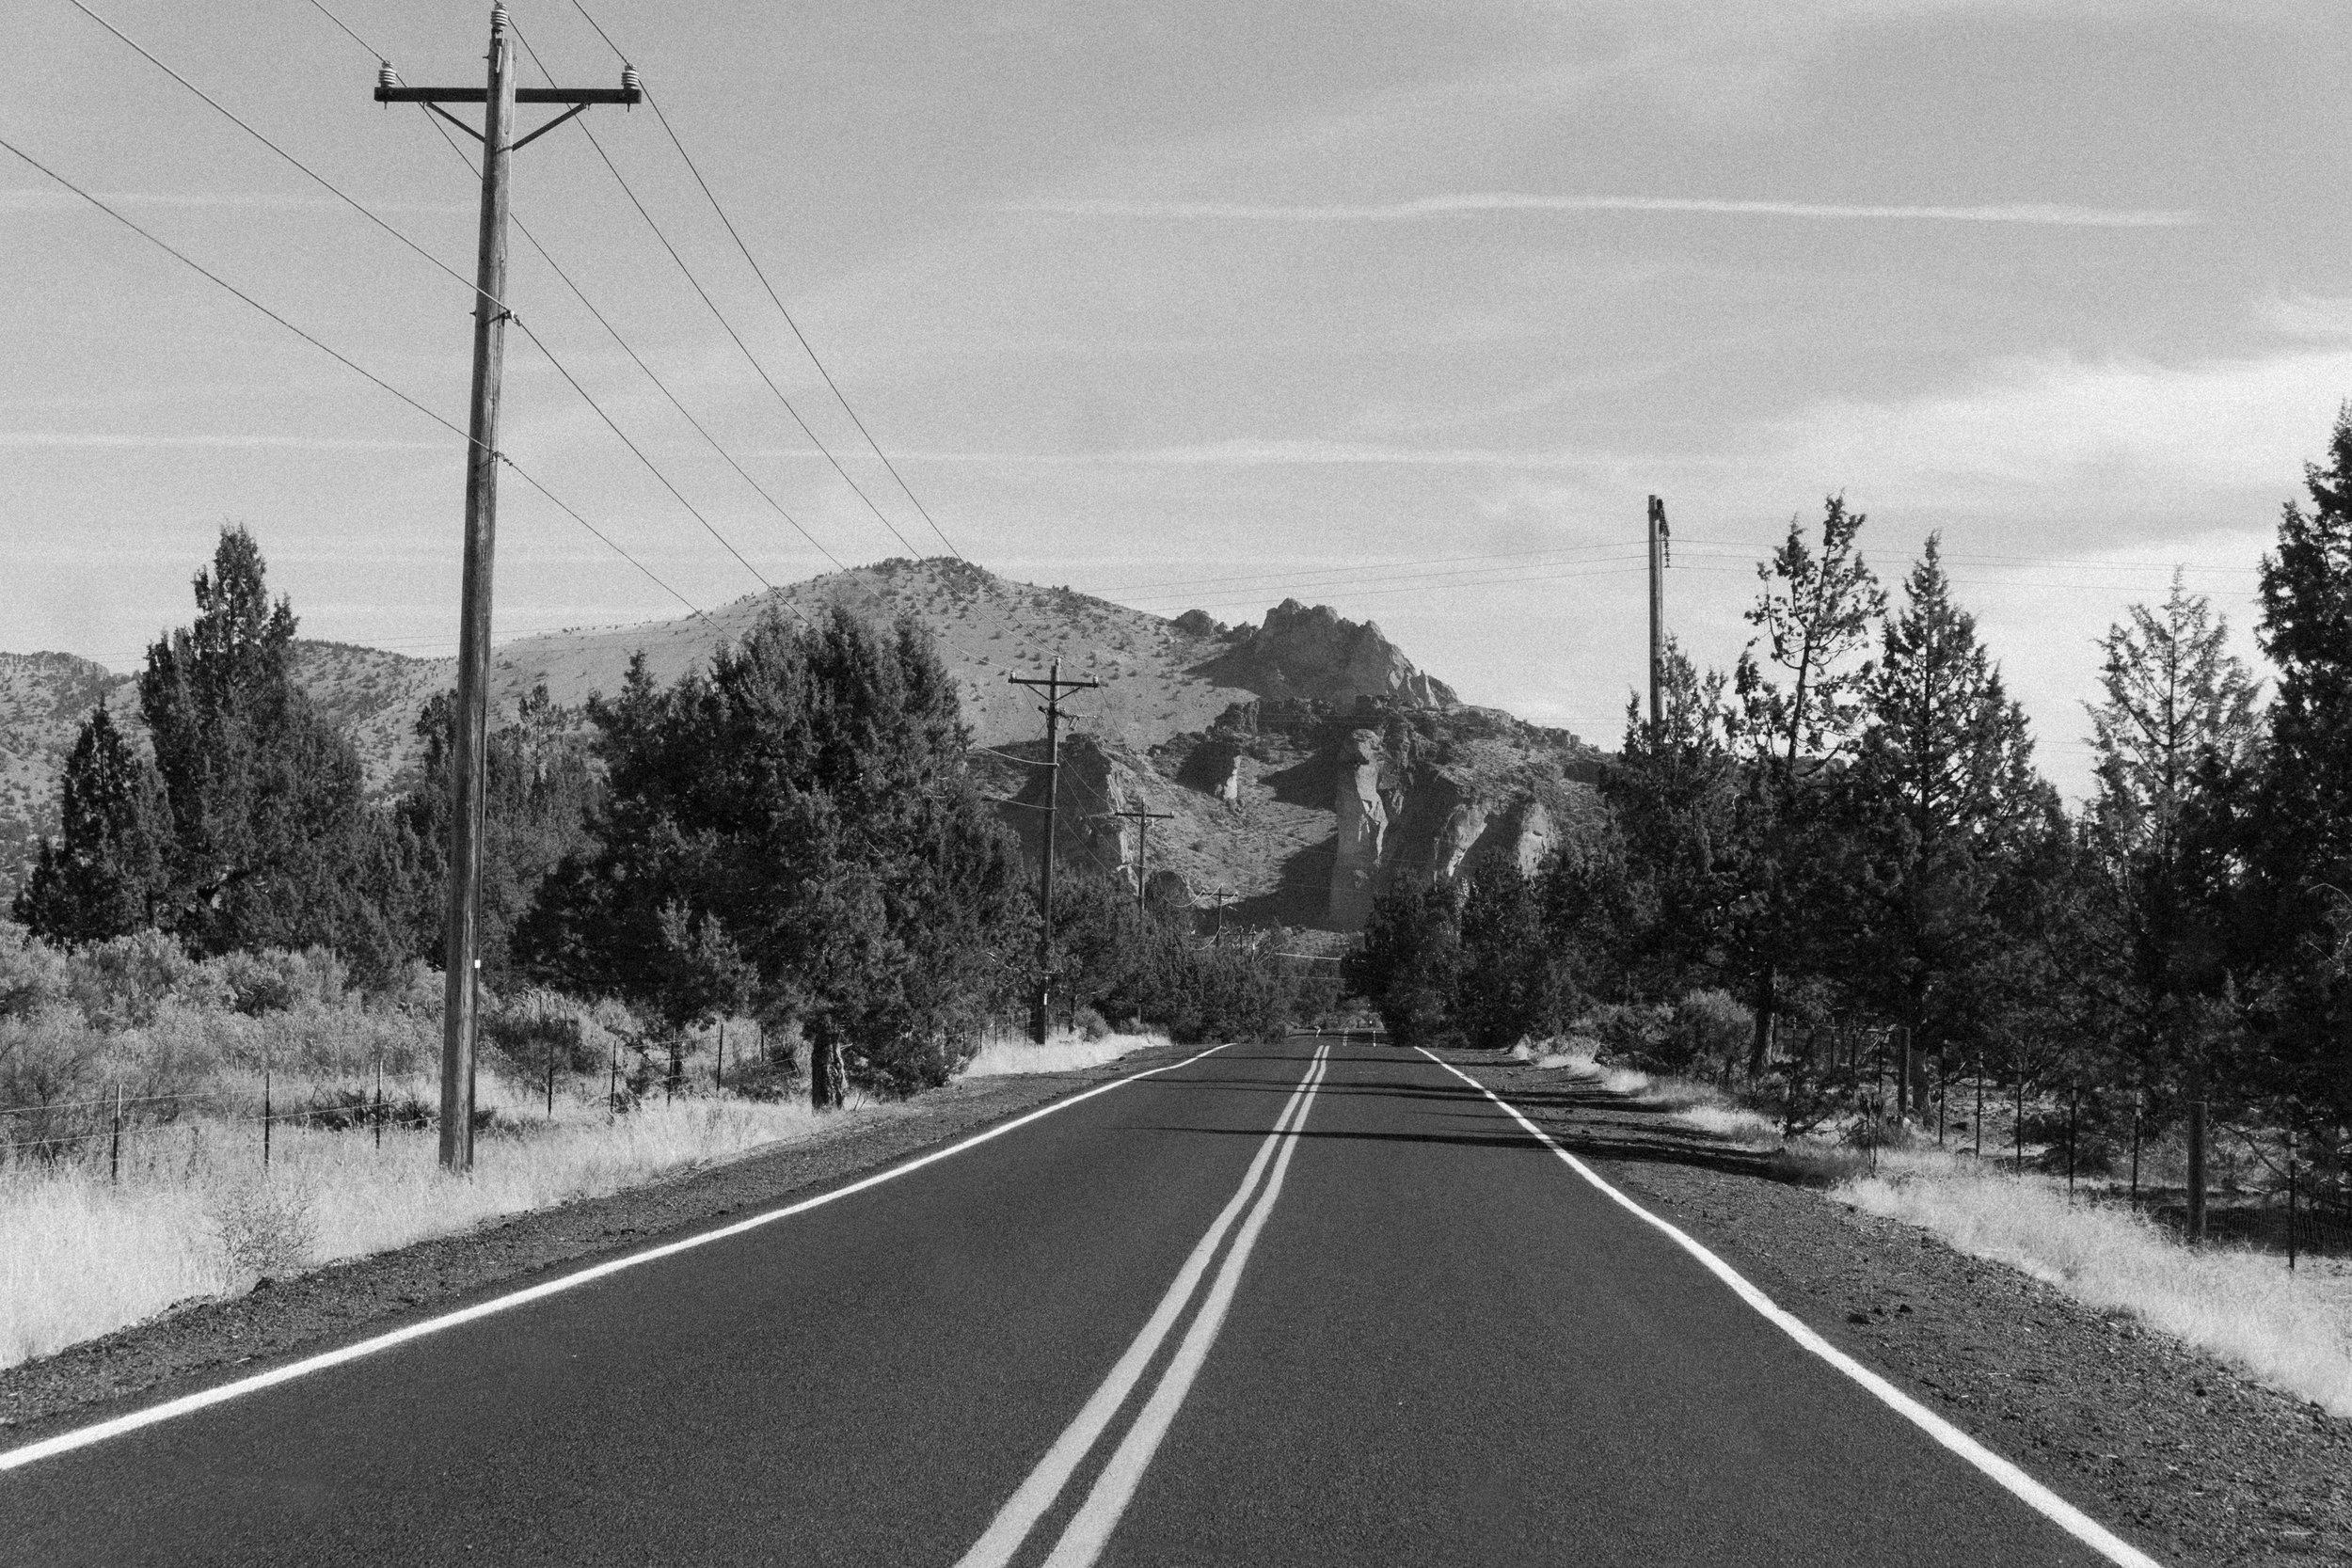 Approaching Smith Rock